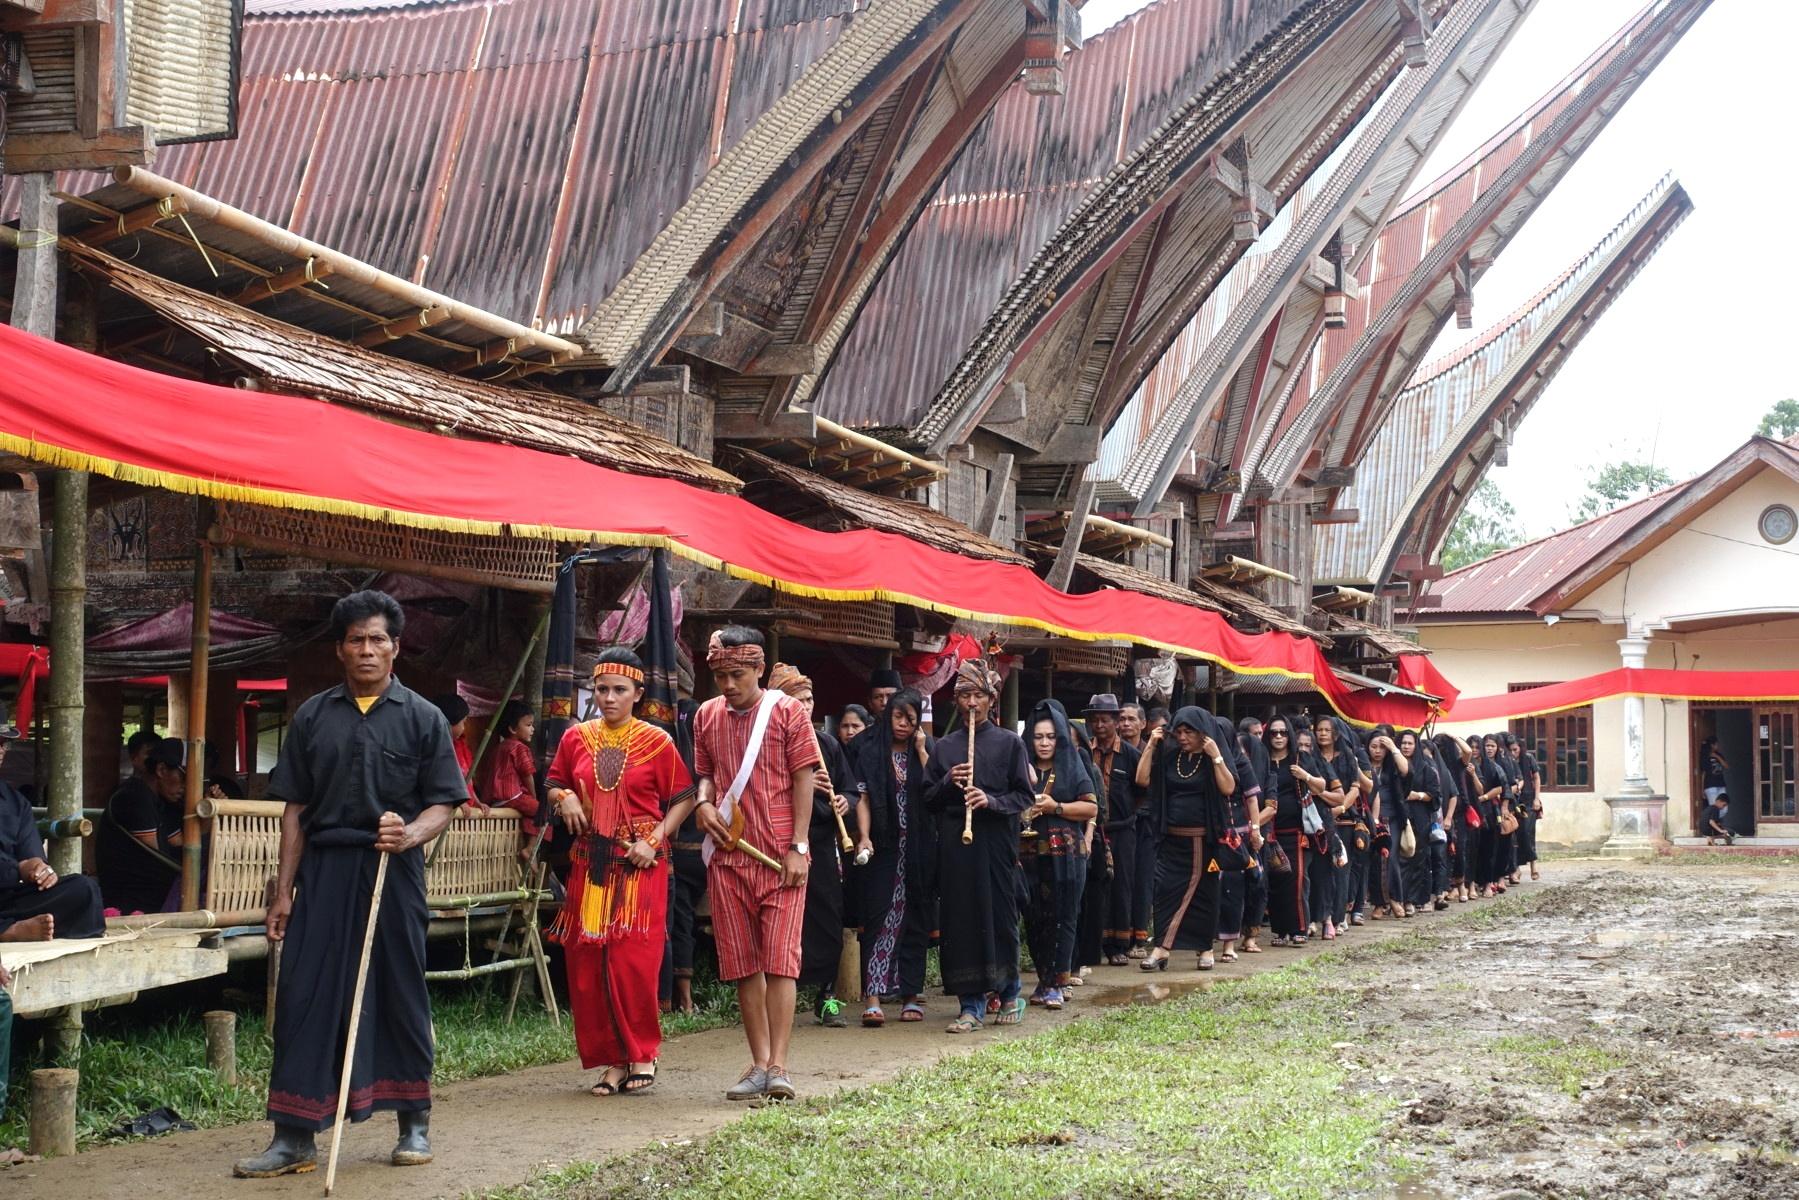 Indonesie_Sulawesi_Toraja_Rantepao DSC04652